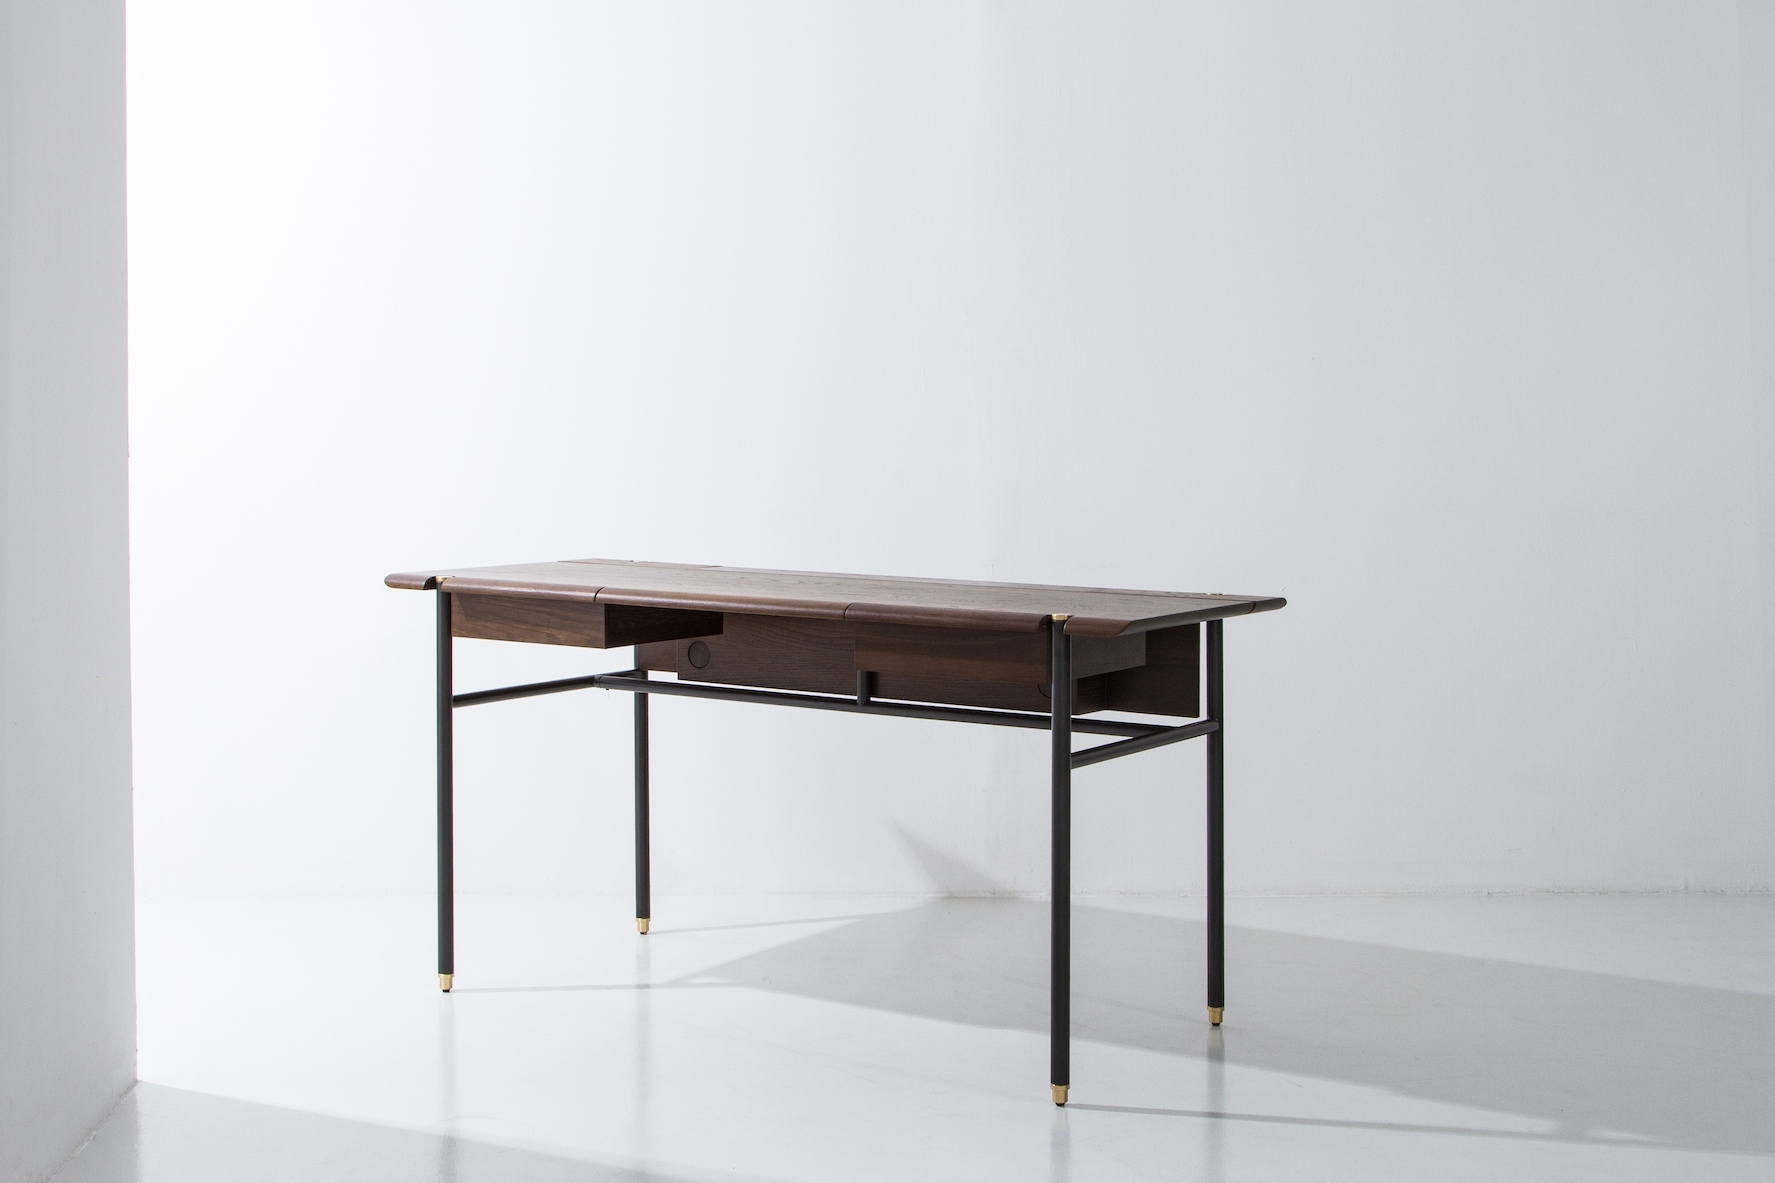 Dunke Design Stacking Desk – Smoked Oak (2)